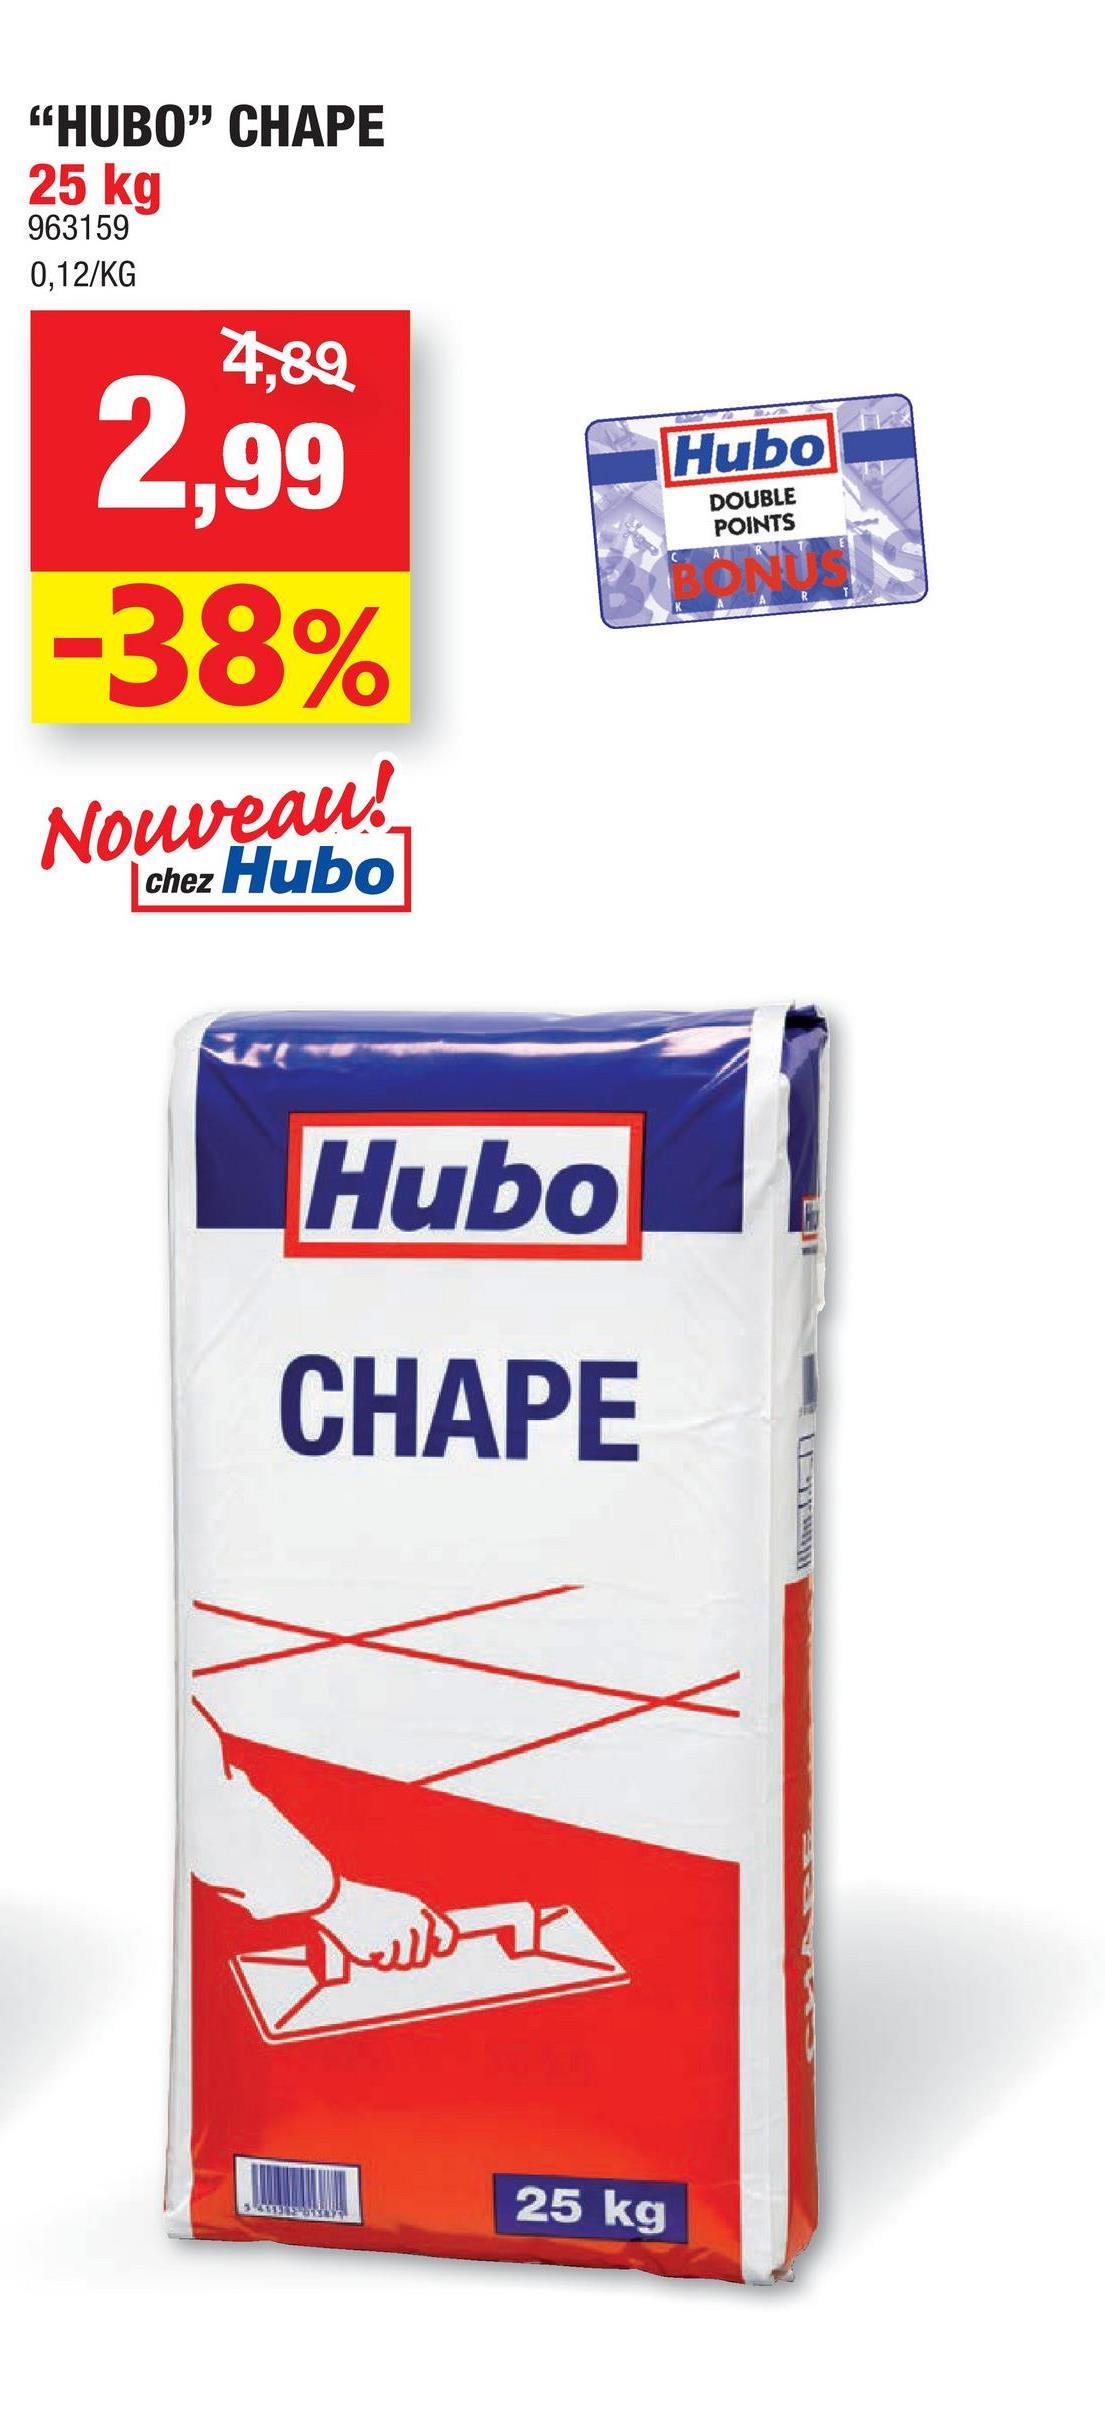 """HUBO"" CHAPE 25 kg 963159 0,12/KG 4,89 Hubo 2,99 -38% DOUBLE POINTS Nouveau! chez Hubo Hubo CHAPE MARIT 22 25 kg"